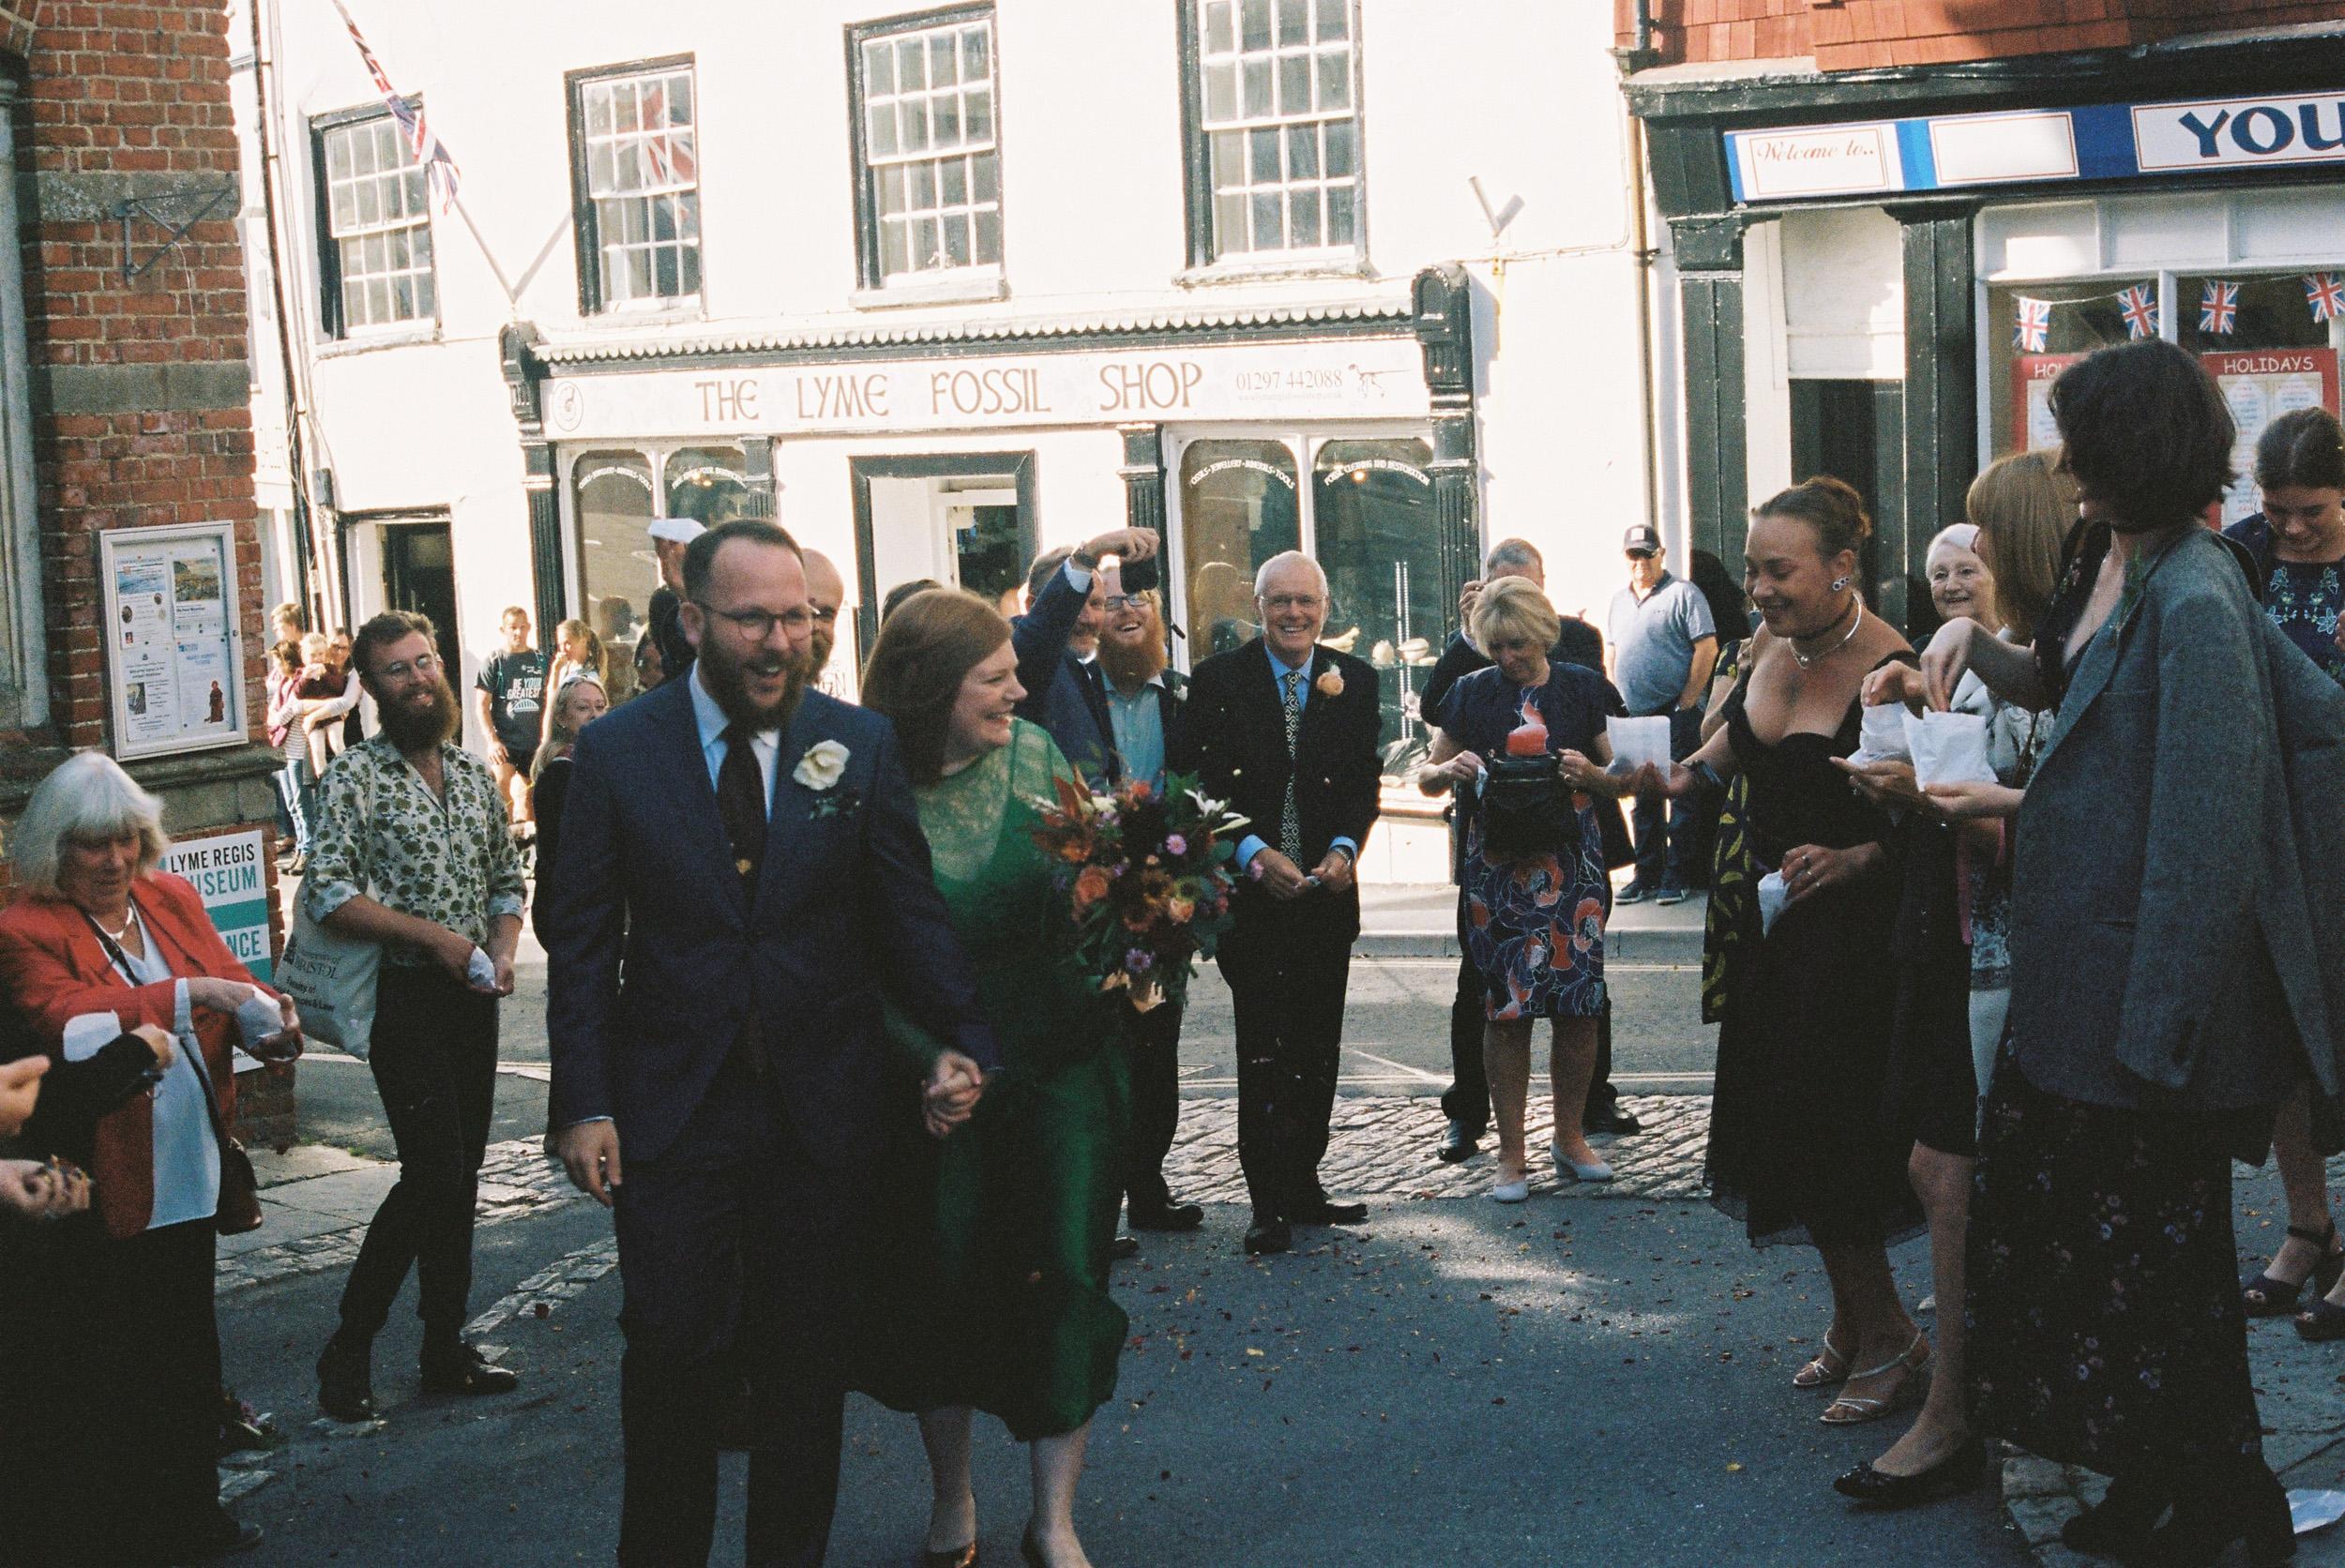 Lucy-Bespoke-Green-Silk-Lace-Wedding-Dress-Kate-Beaumont-Sheffield-11.jpg